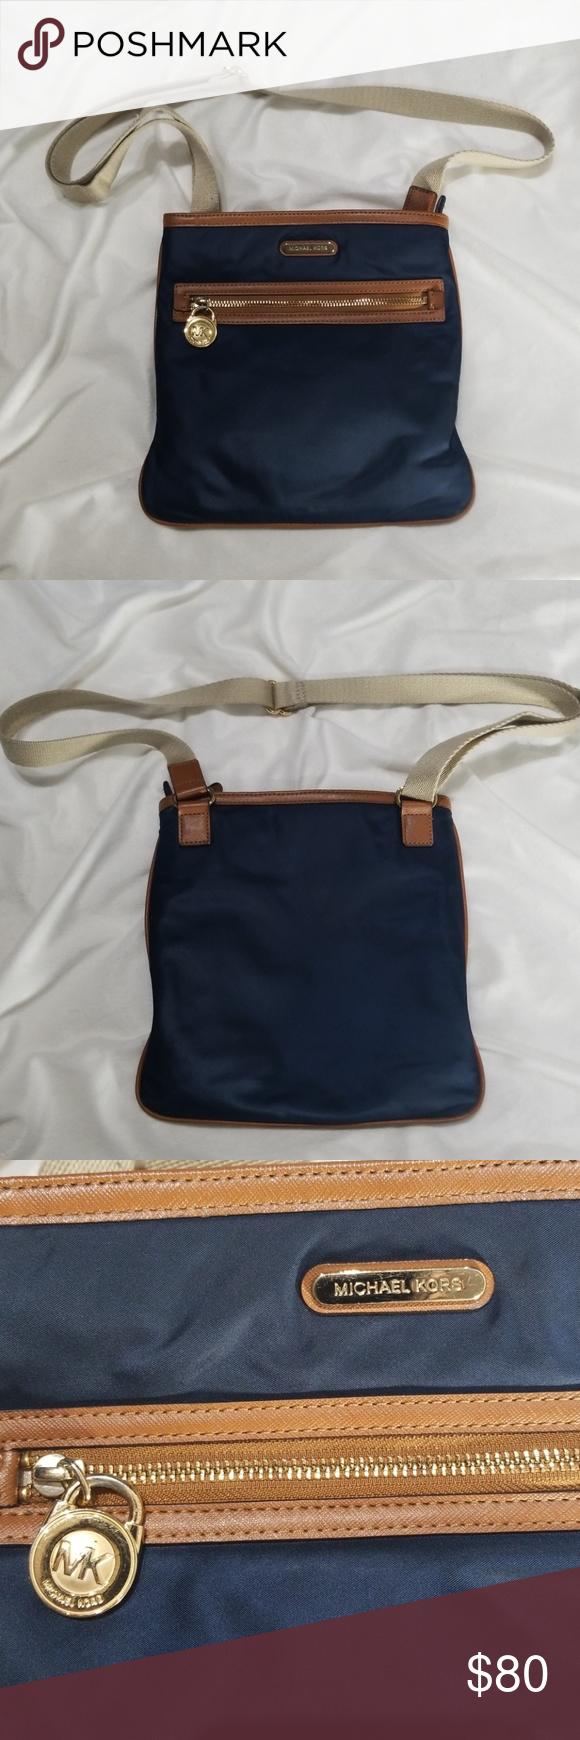 09a362e923dd9b Michael Kors Crossbody Purse Michael Kors Crossbody purse. Navy Blue vinyl with  brown leather trim